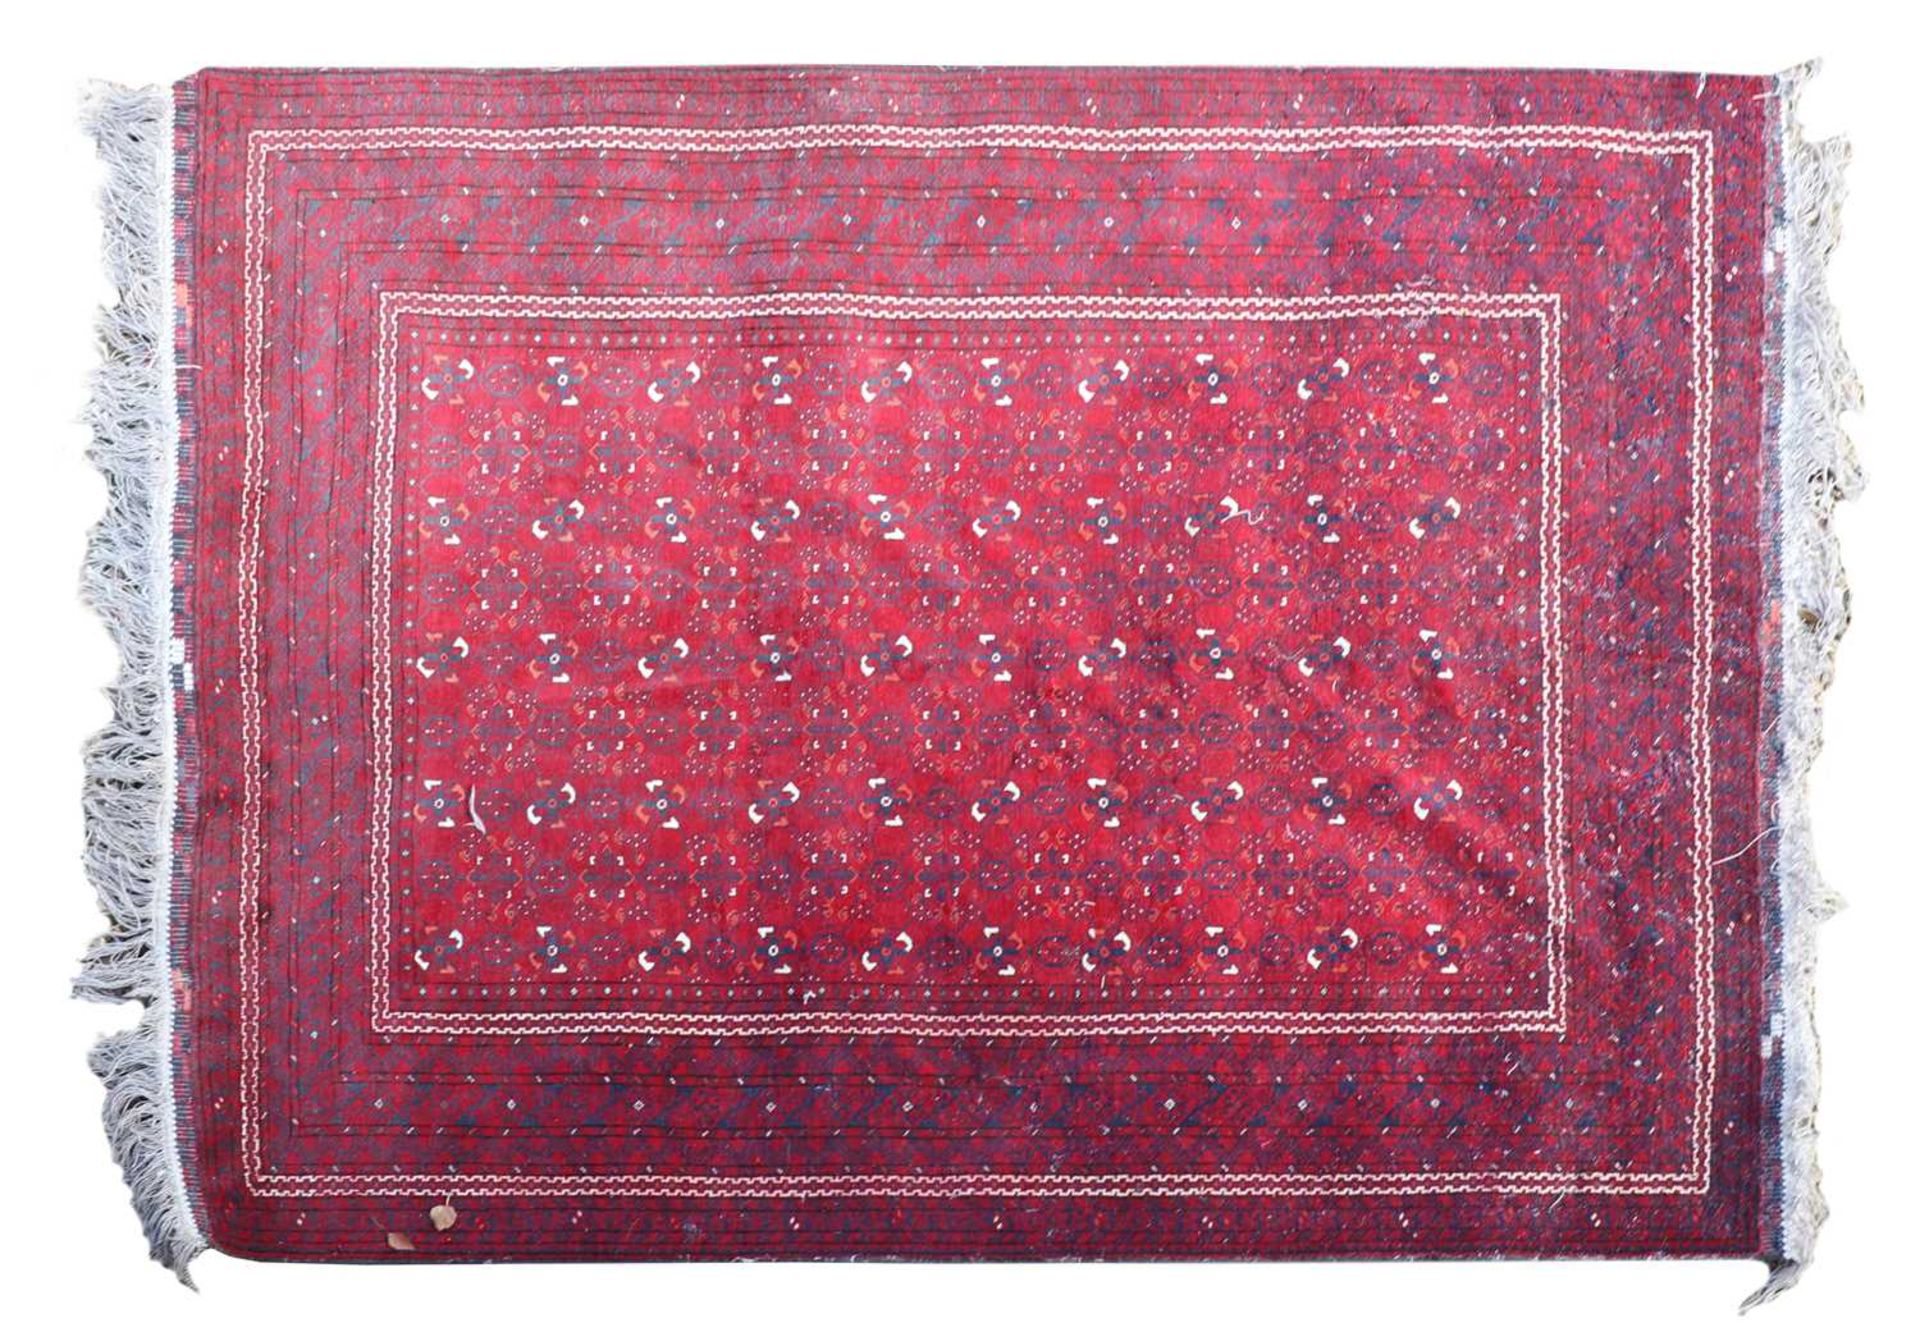 An Afghan Beshir rug, - Image 2 of 17